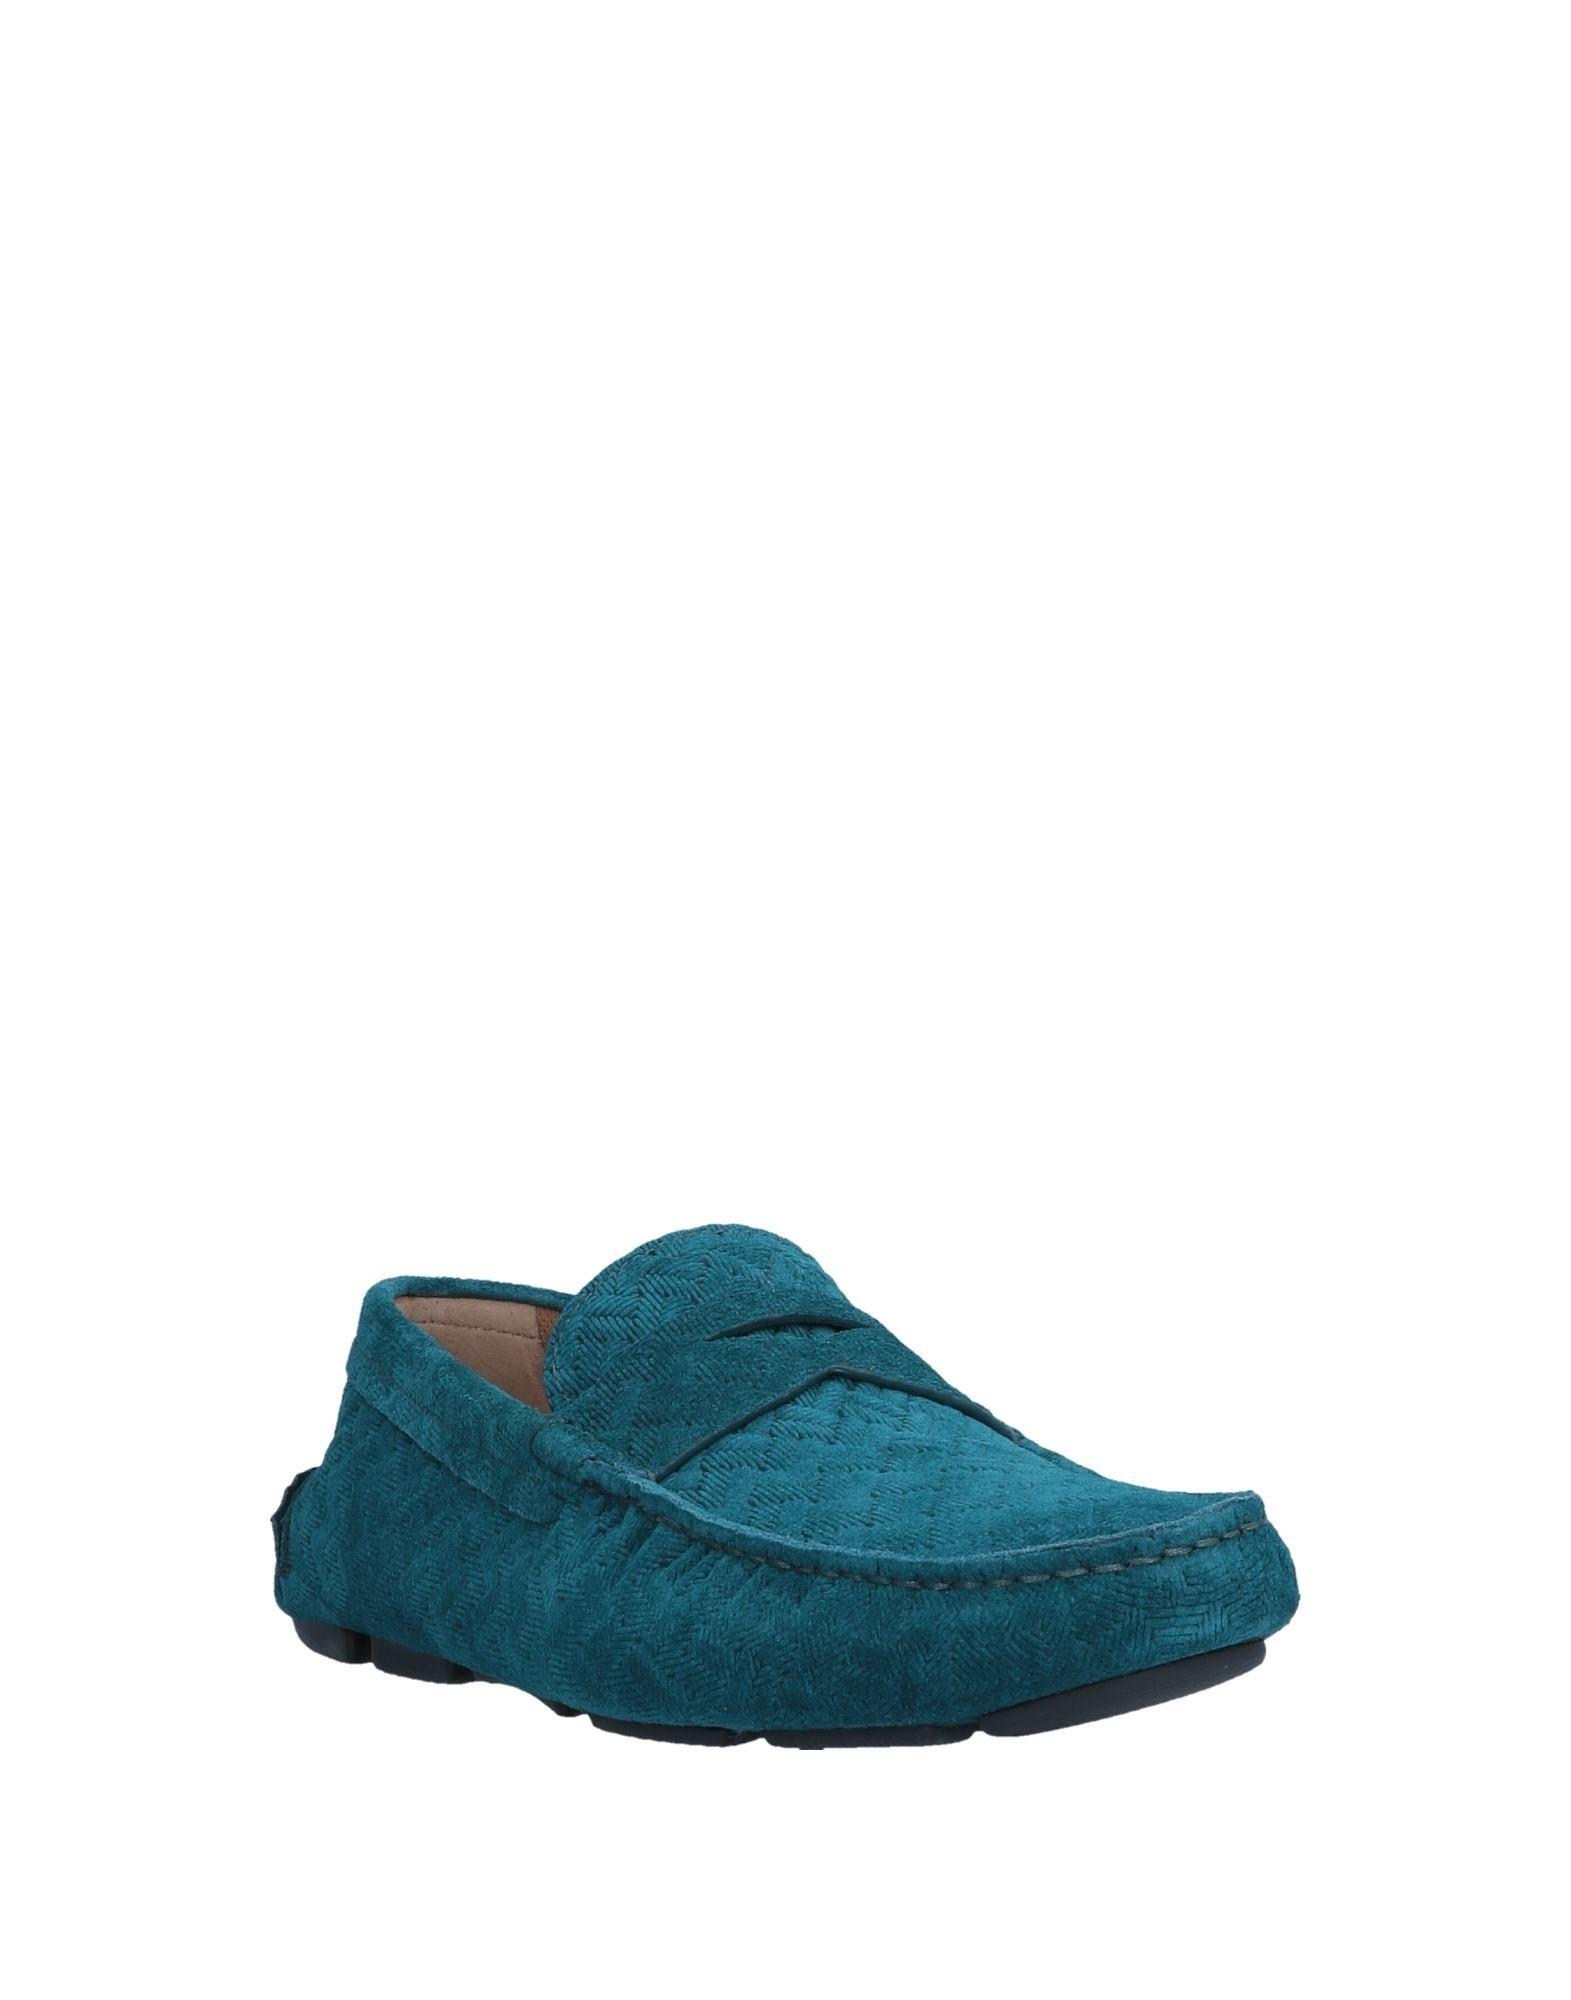 Giorgio Armani Gute Mokassins Herren  11552571KH Gute Armani Qualität beliebte Schuhe c71de6